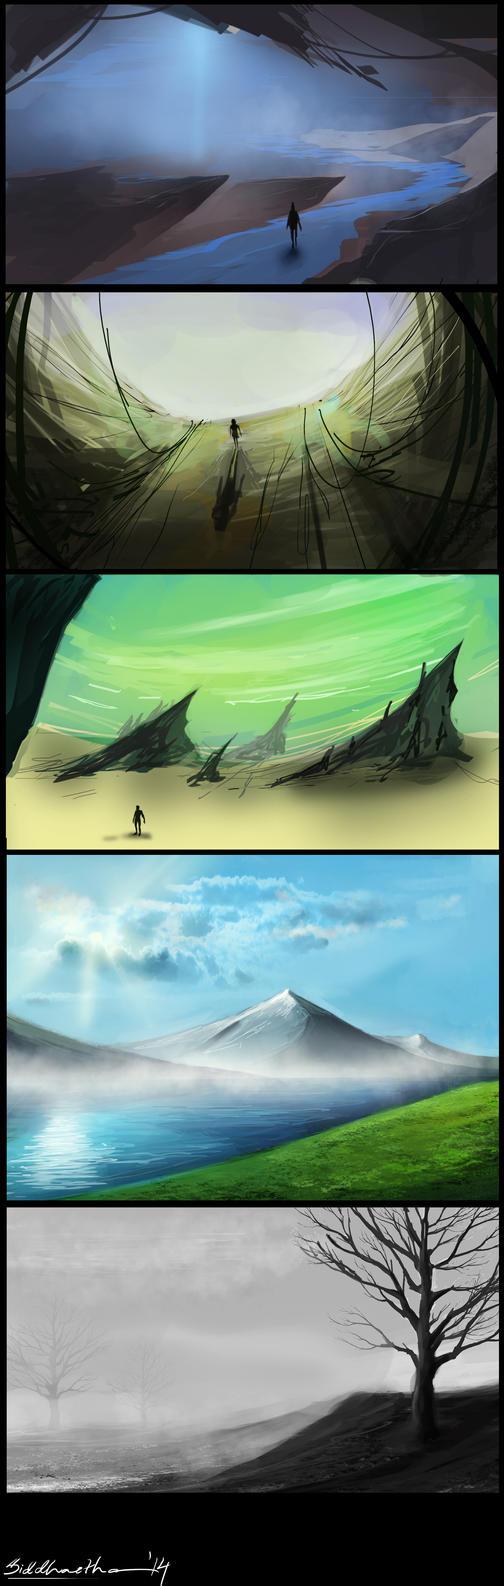 Environment Sketchdump by Sid-axn